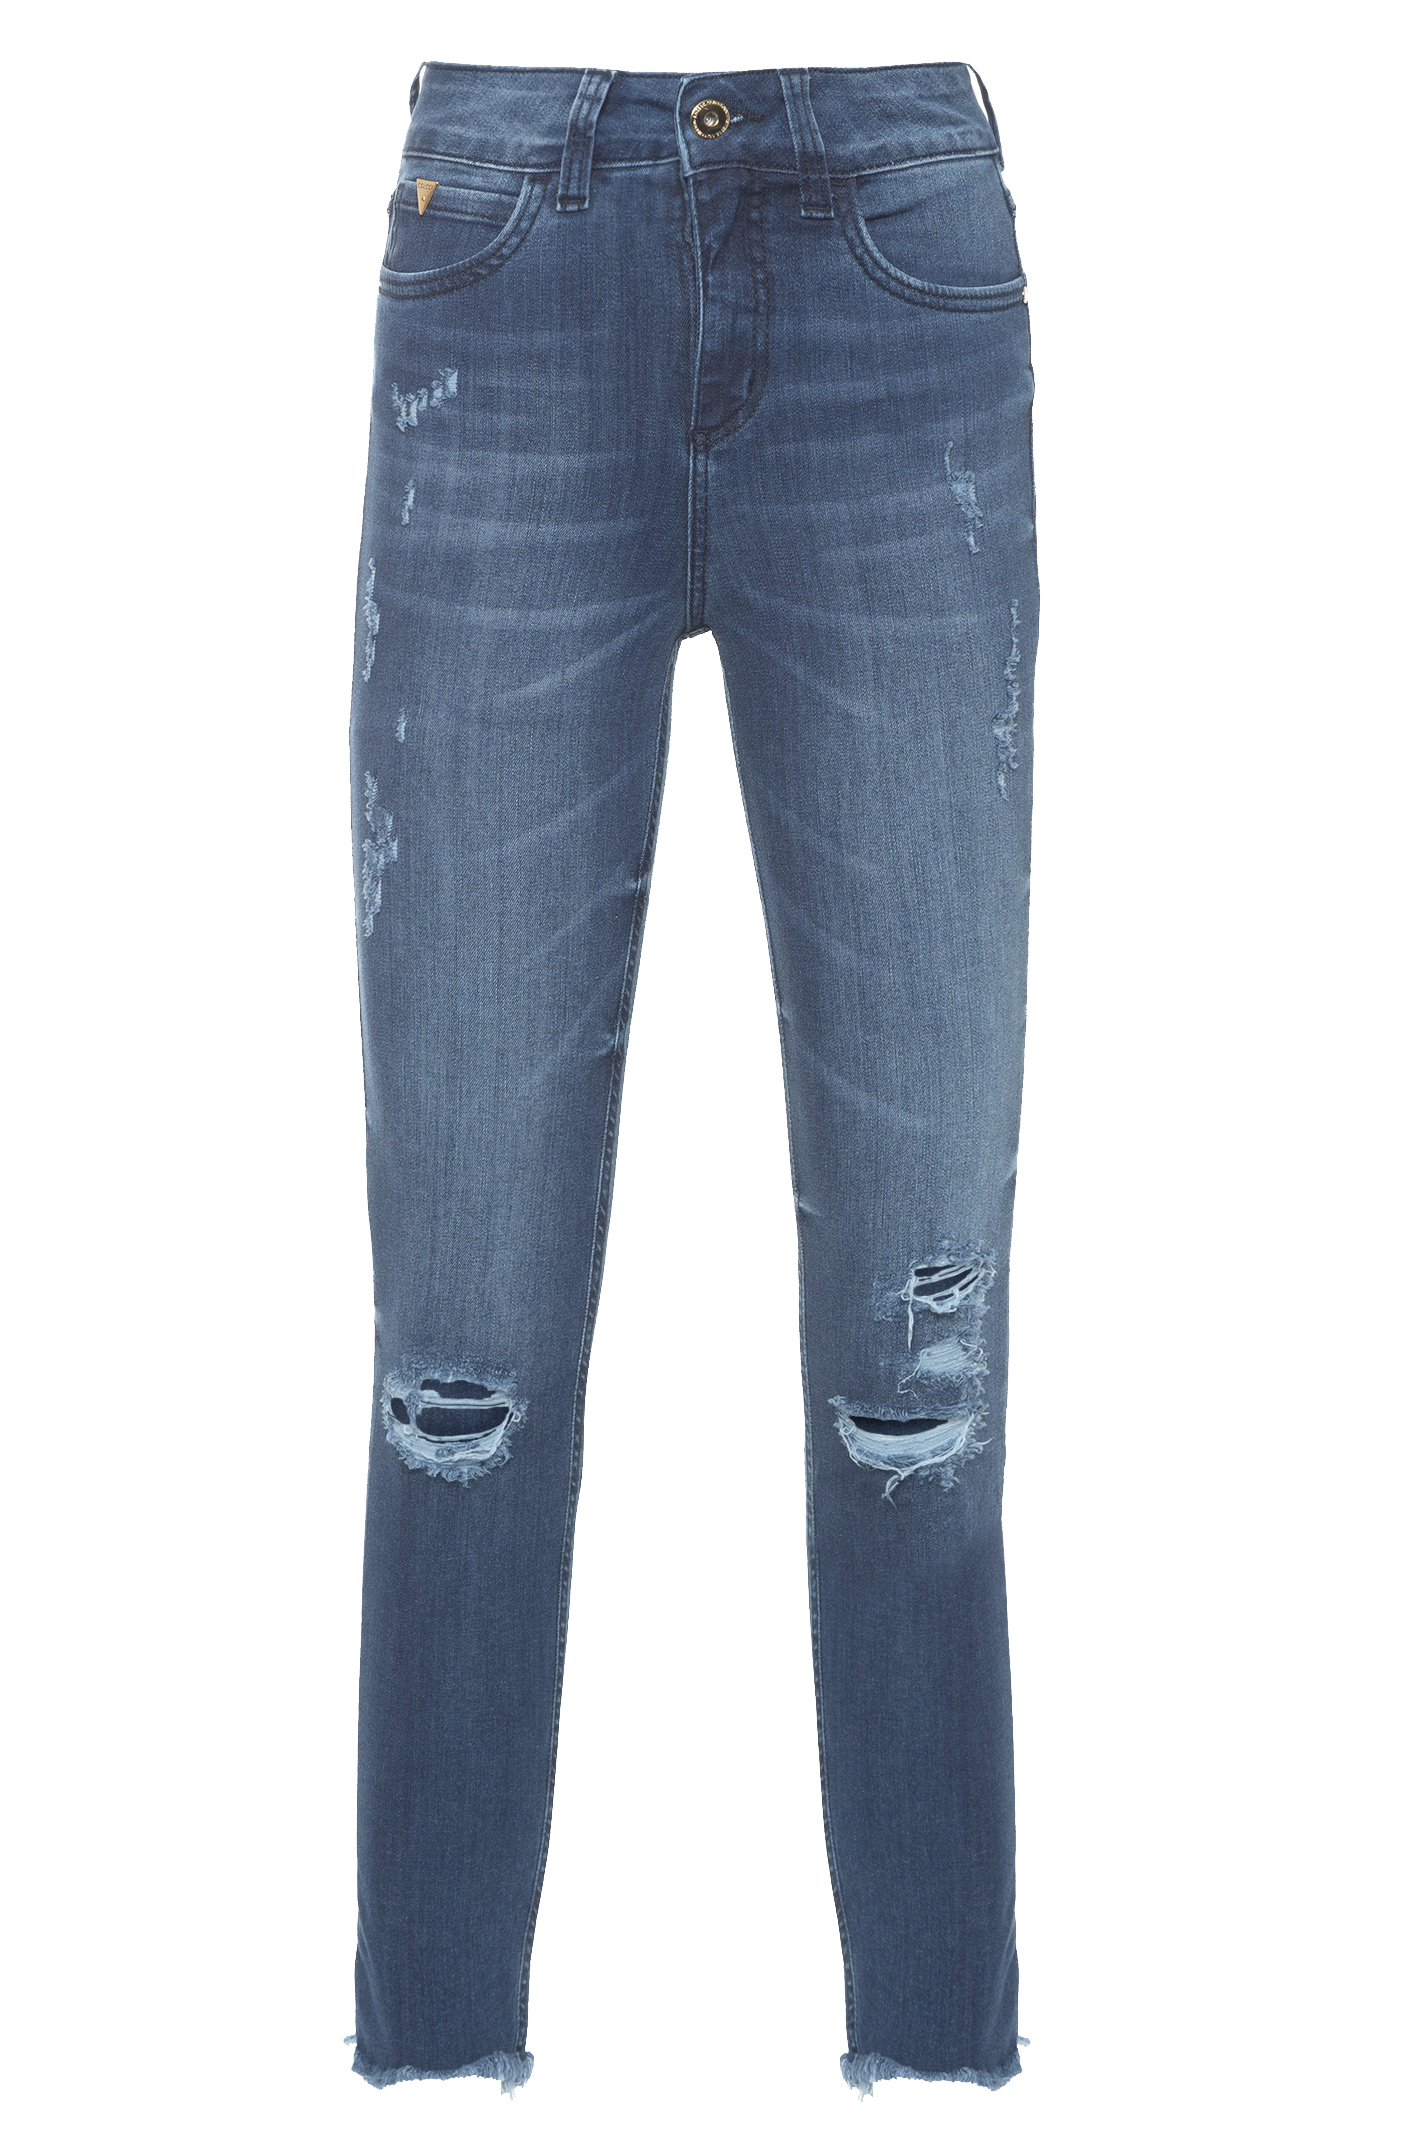 Calca Jeans Bia